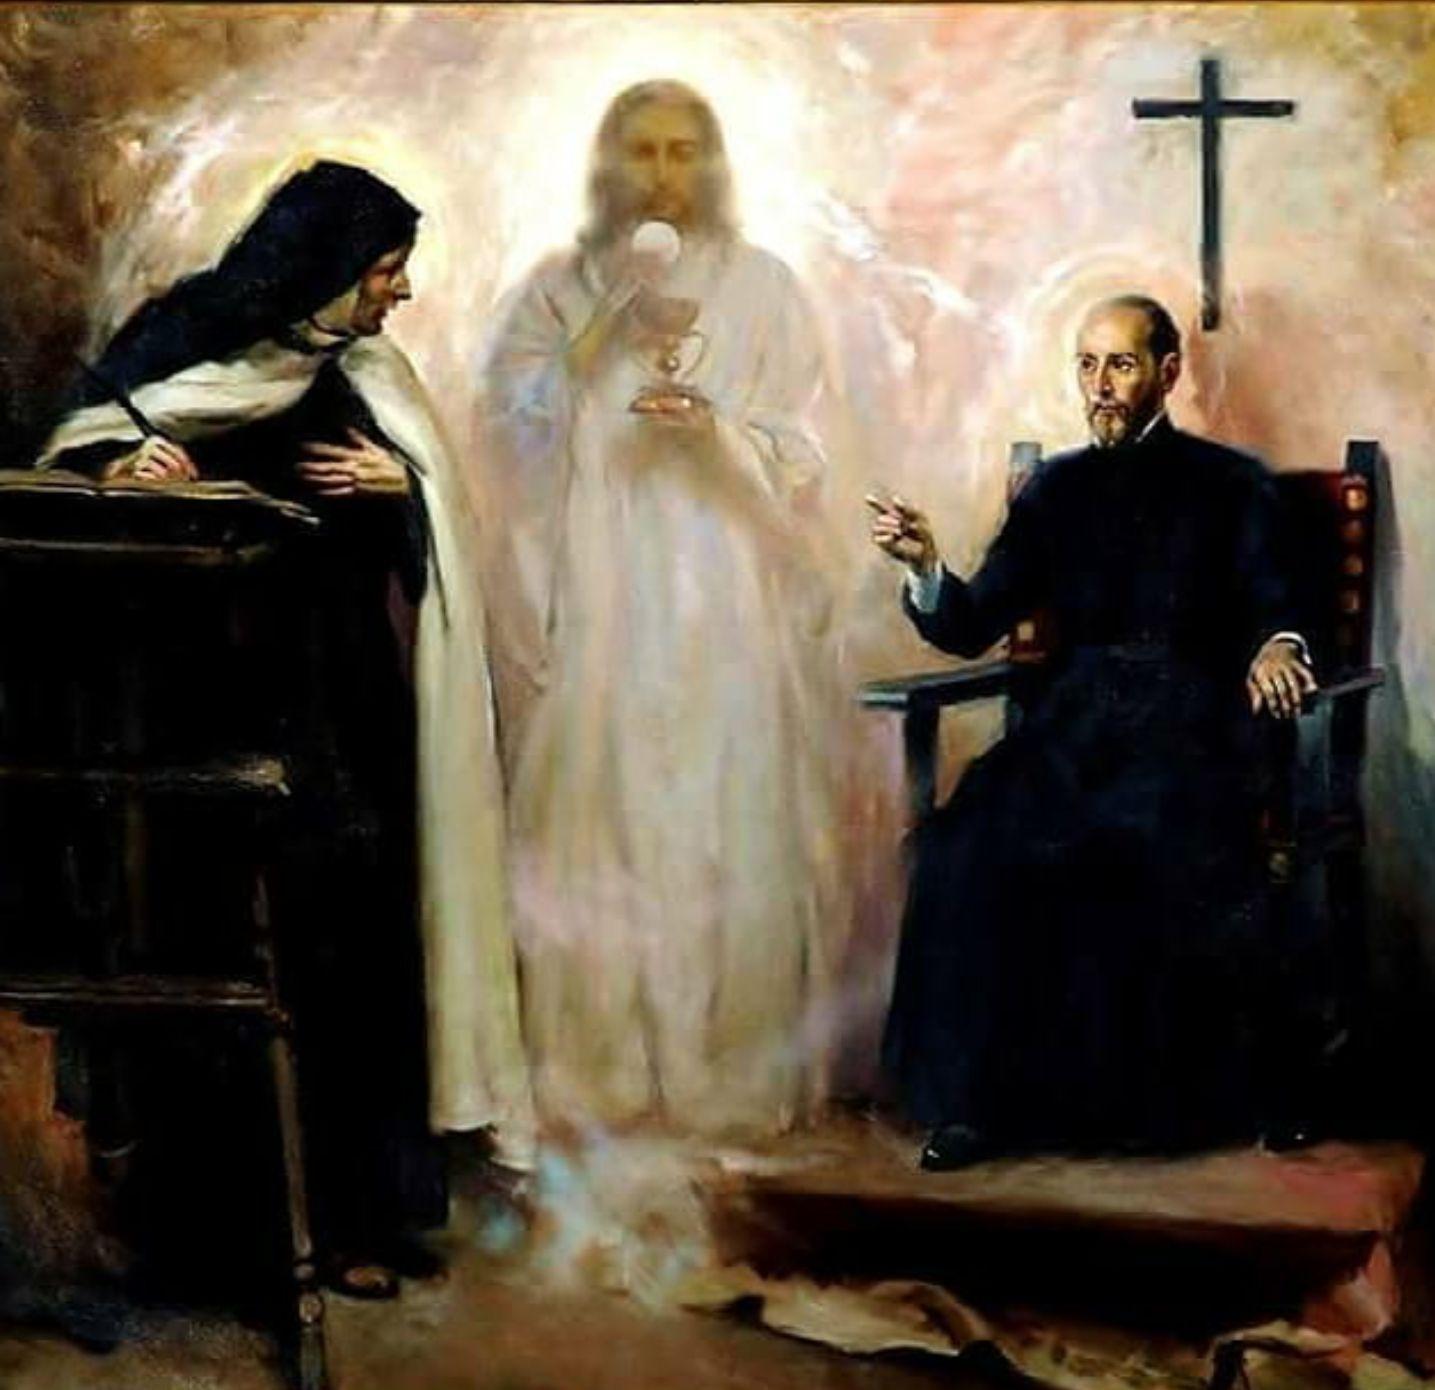 Jesus and Saint Teresa at Holy Communion